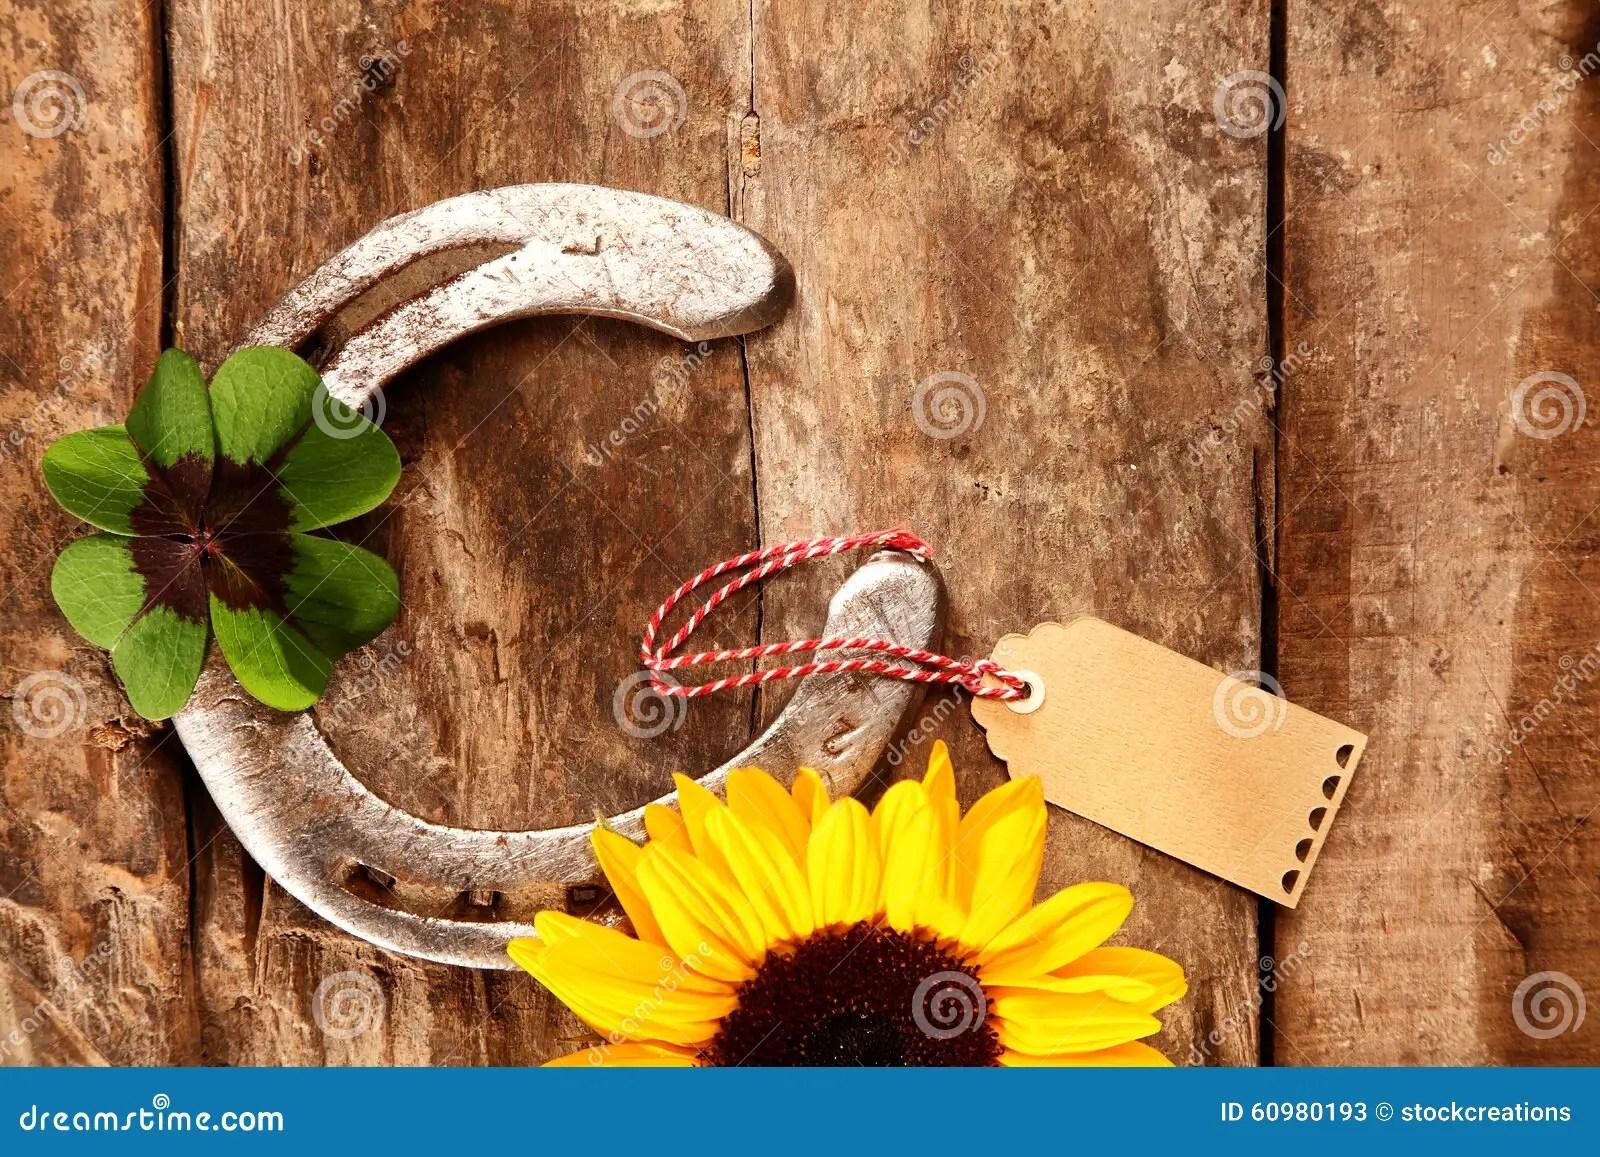 Old Wood Wallpaper Hd Shiny Metal Horseshoe With An Irish Shamrock Stock Photo